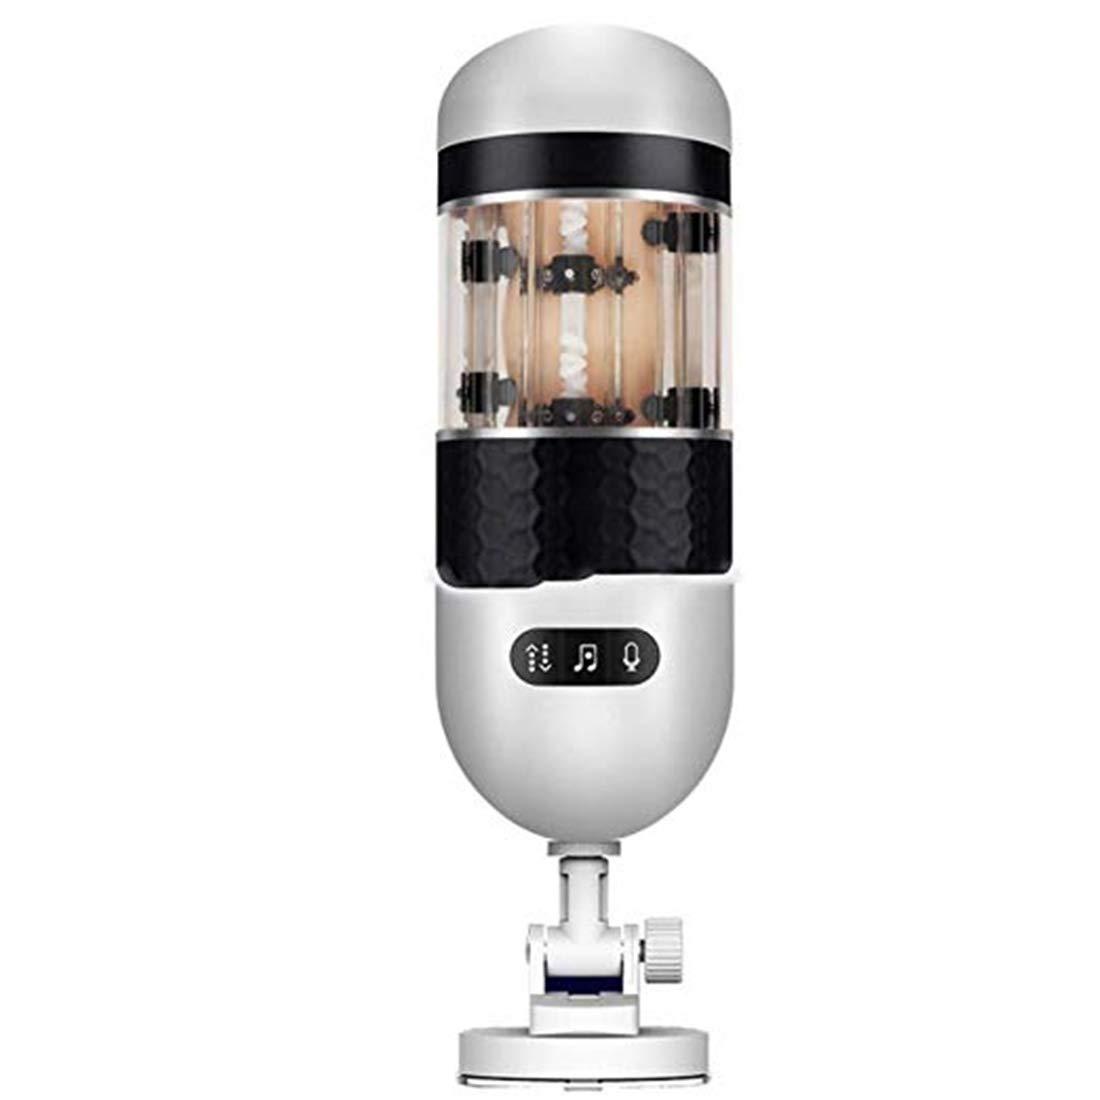 Auferstehung'Go Dlzaq 3D Vibrating Cup Vaginal Masturbieren -Masturbation Cup Vagina & Anal Sex Toys - Silikon 8 Vibrationsmodi